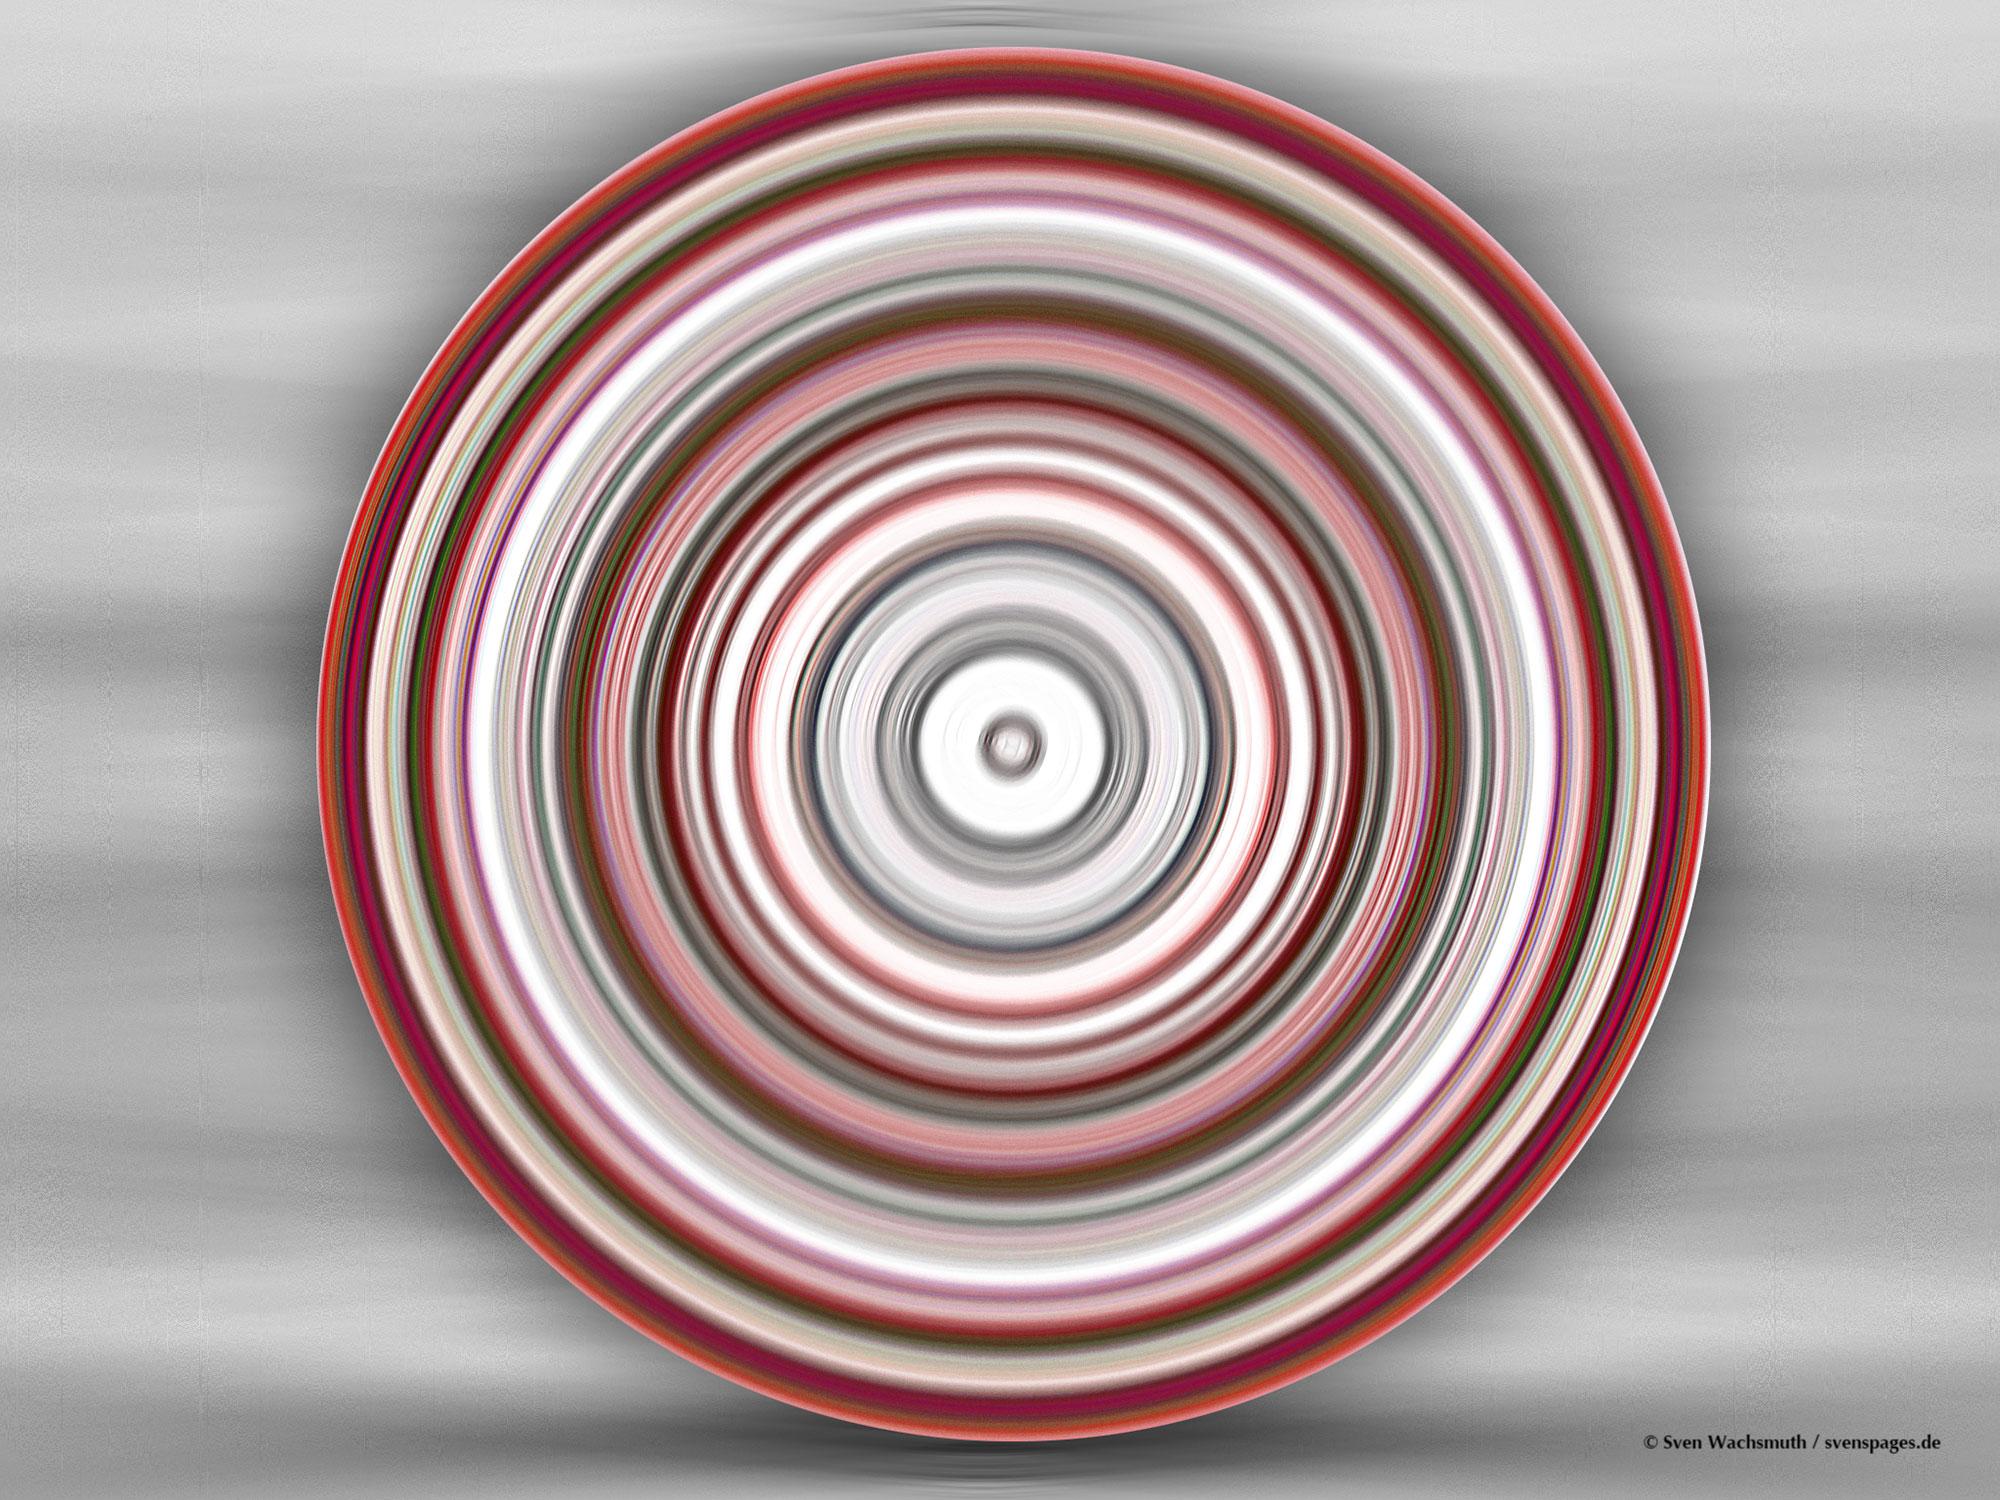 2005-03-25-rotating-disc